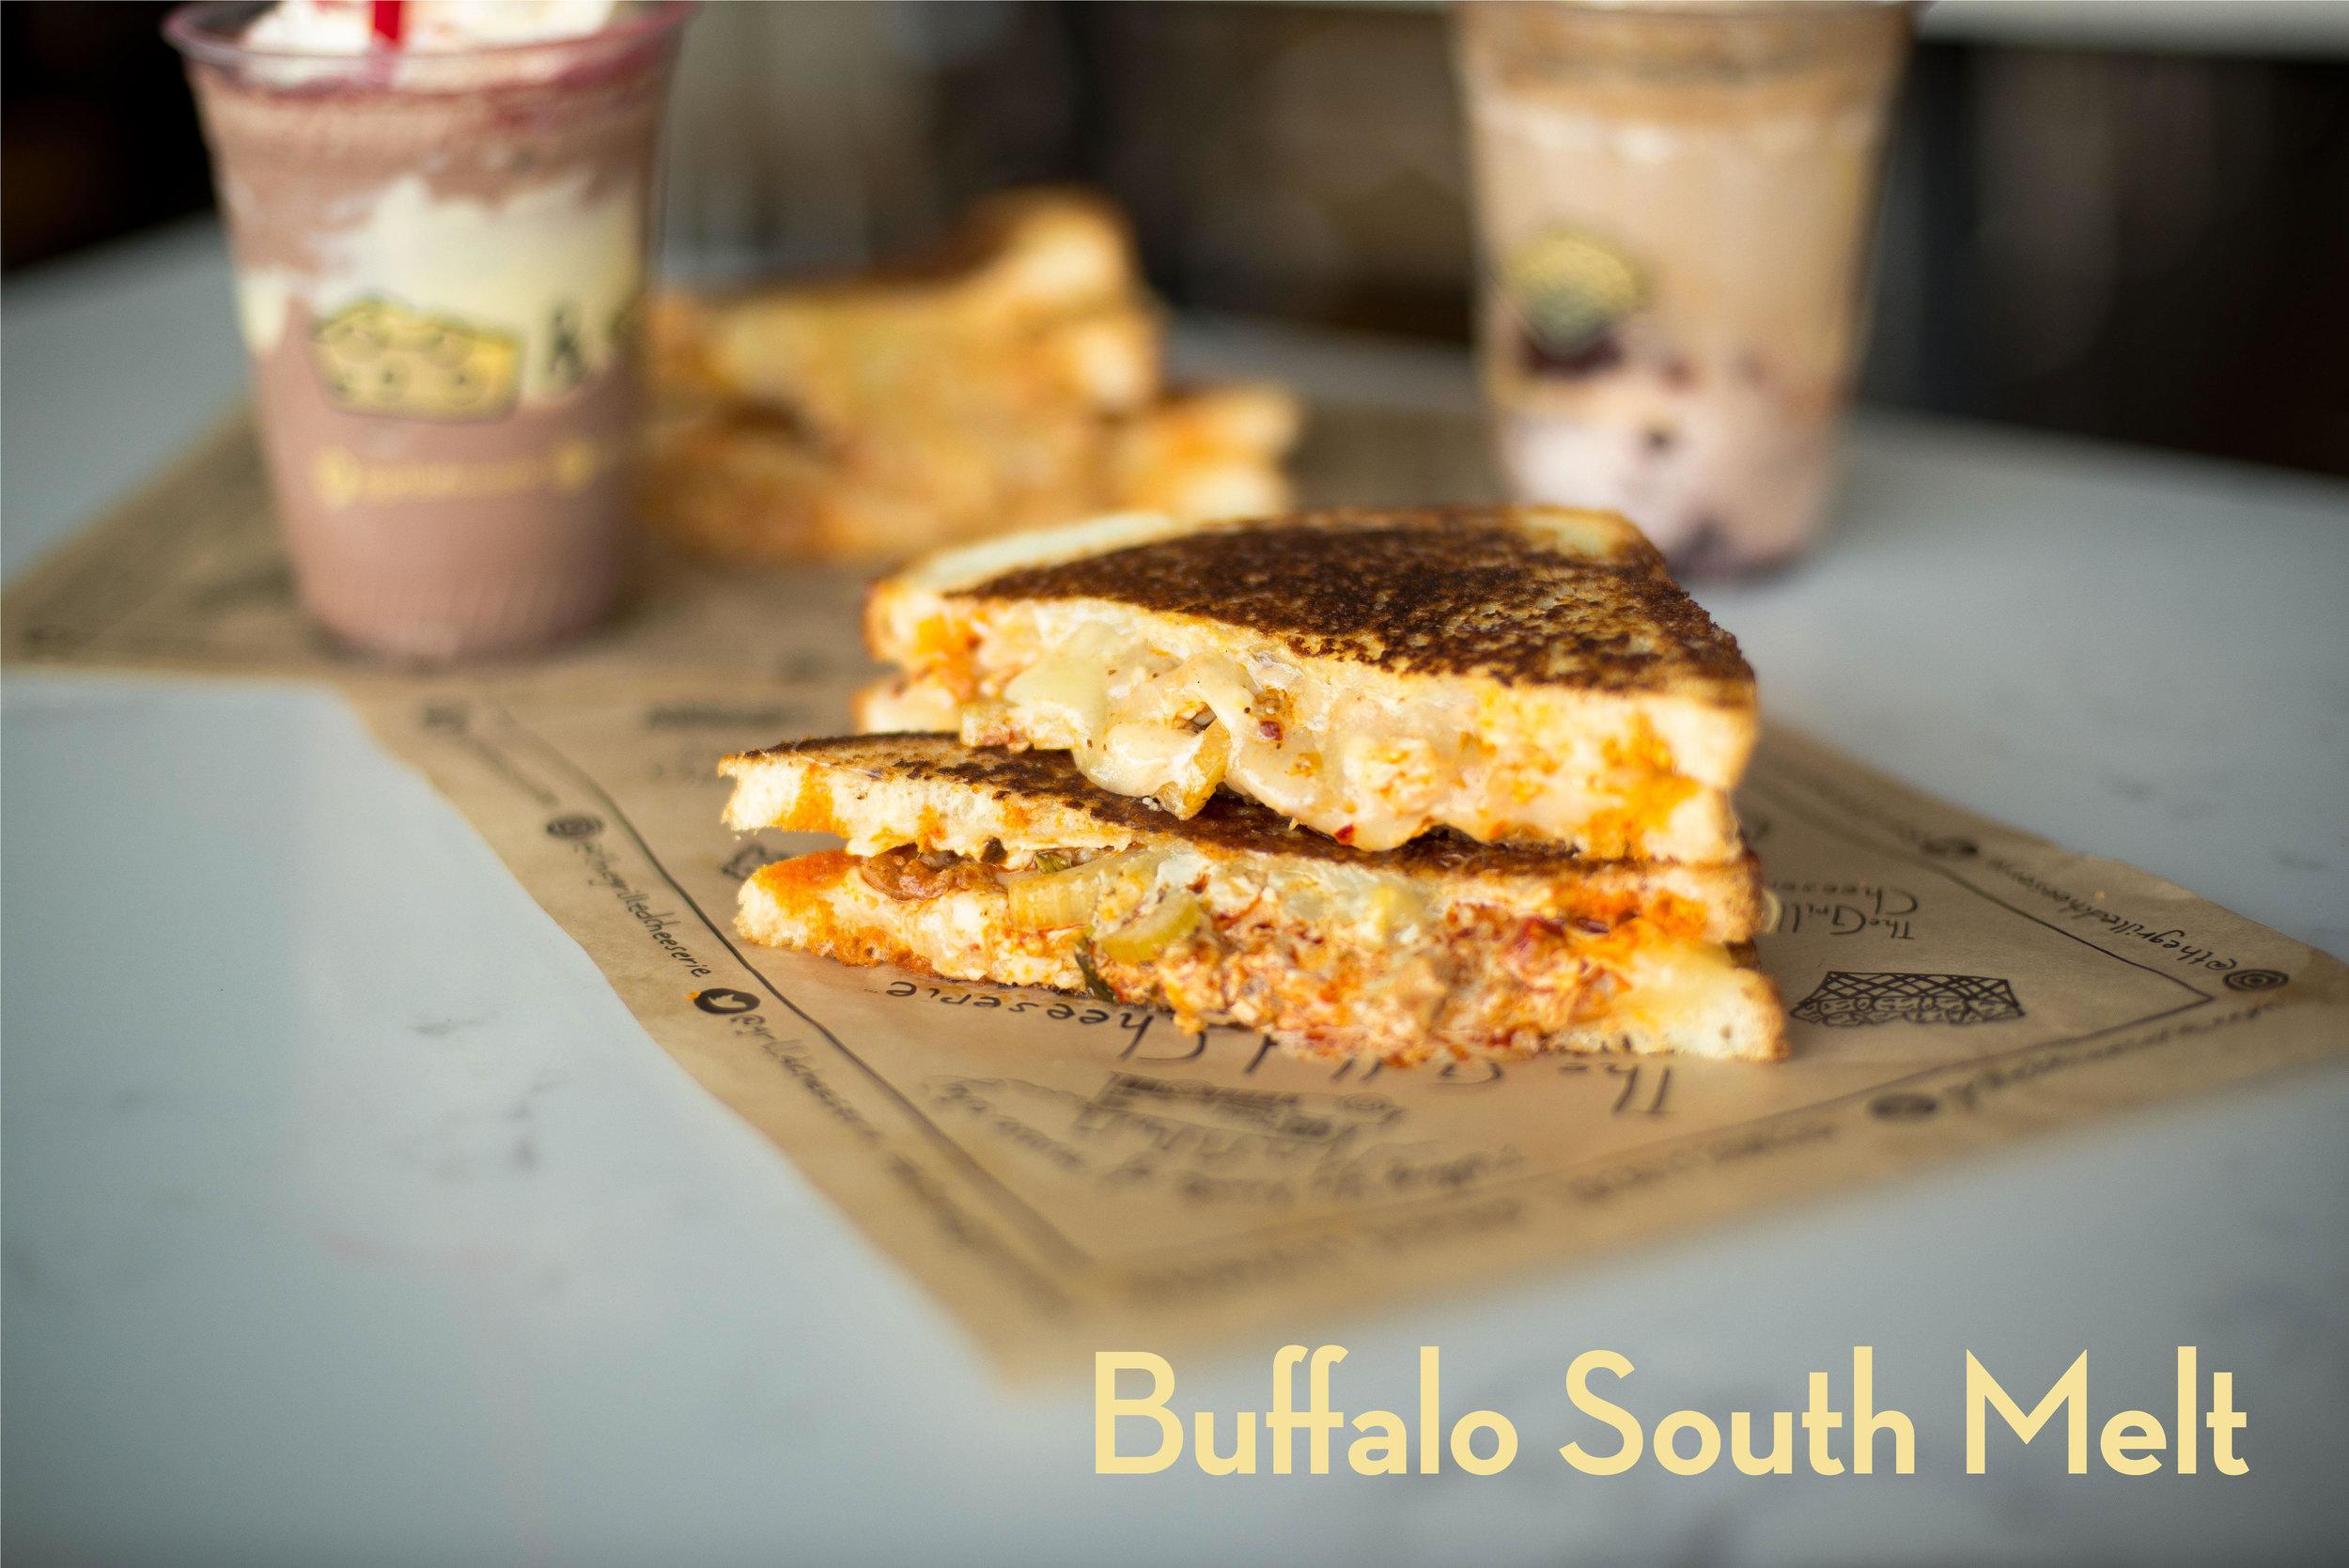 Buffalo South Melt